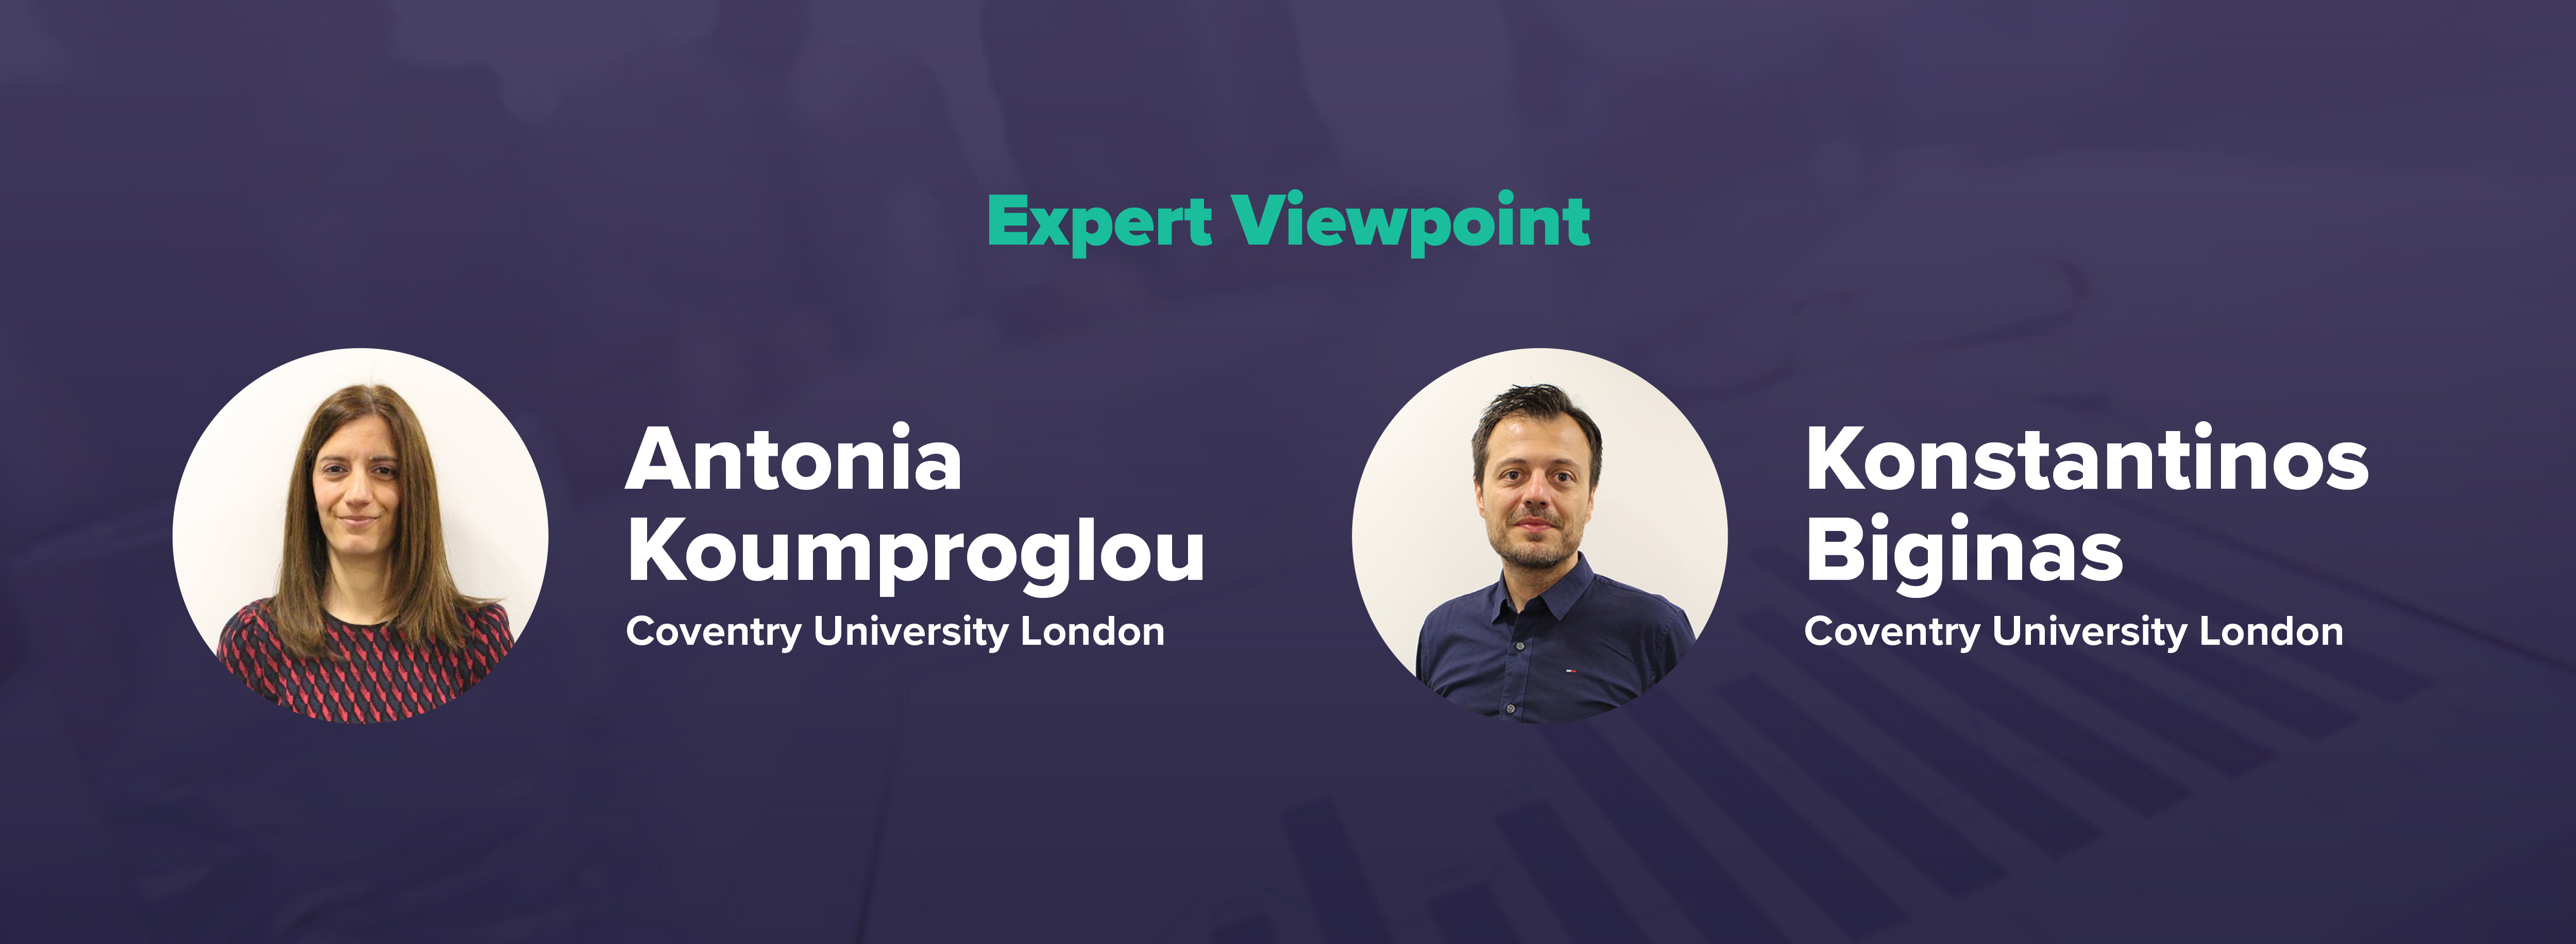 Expert Viewpoint: Develop Your Entrepreneurial Spirit